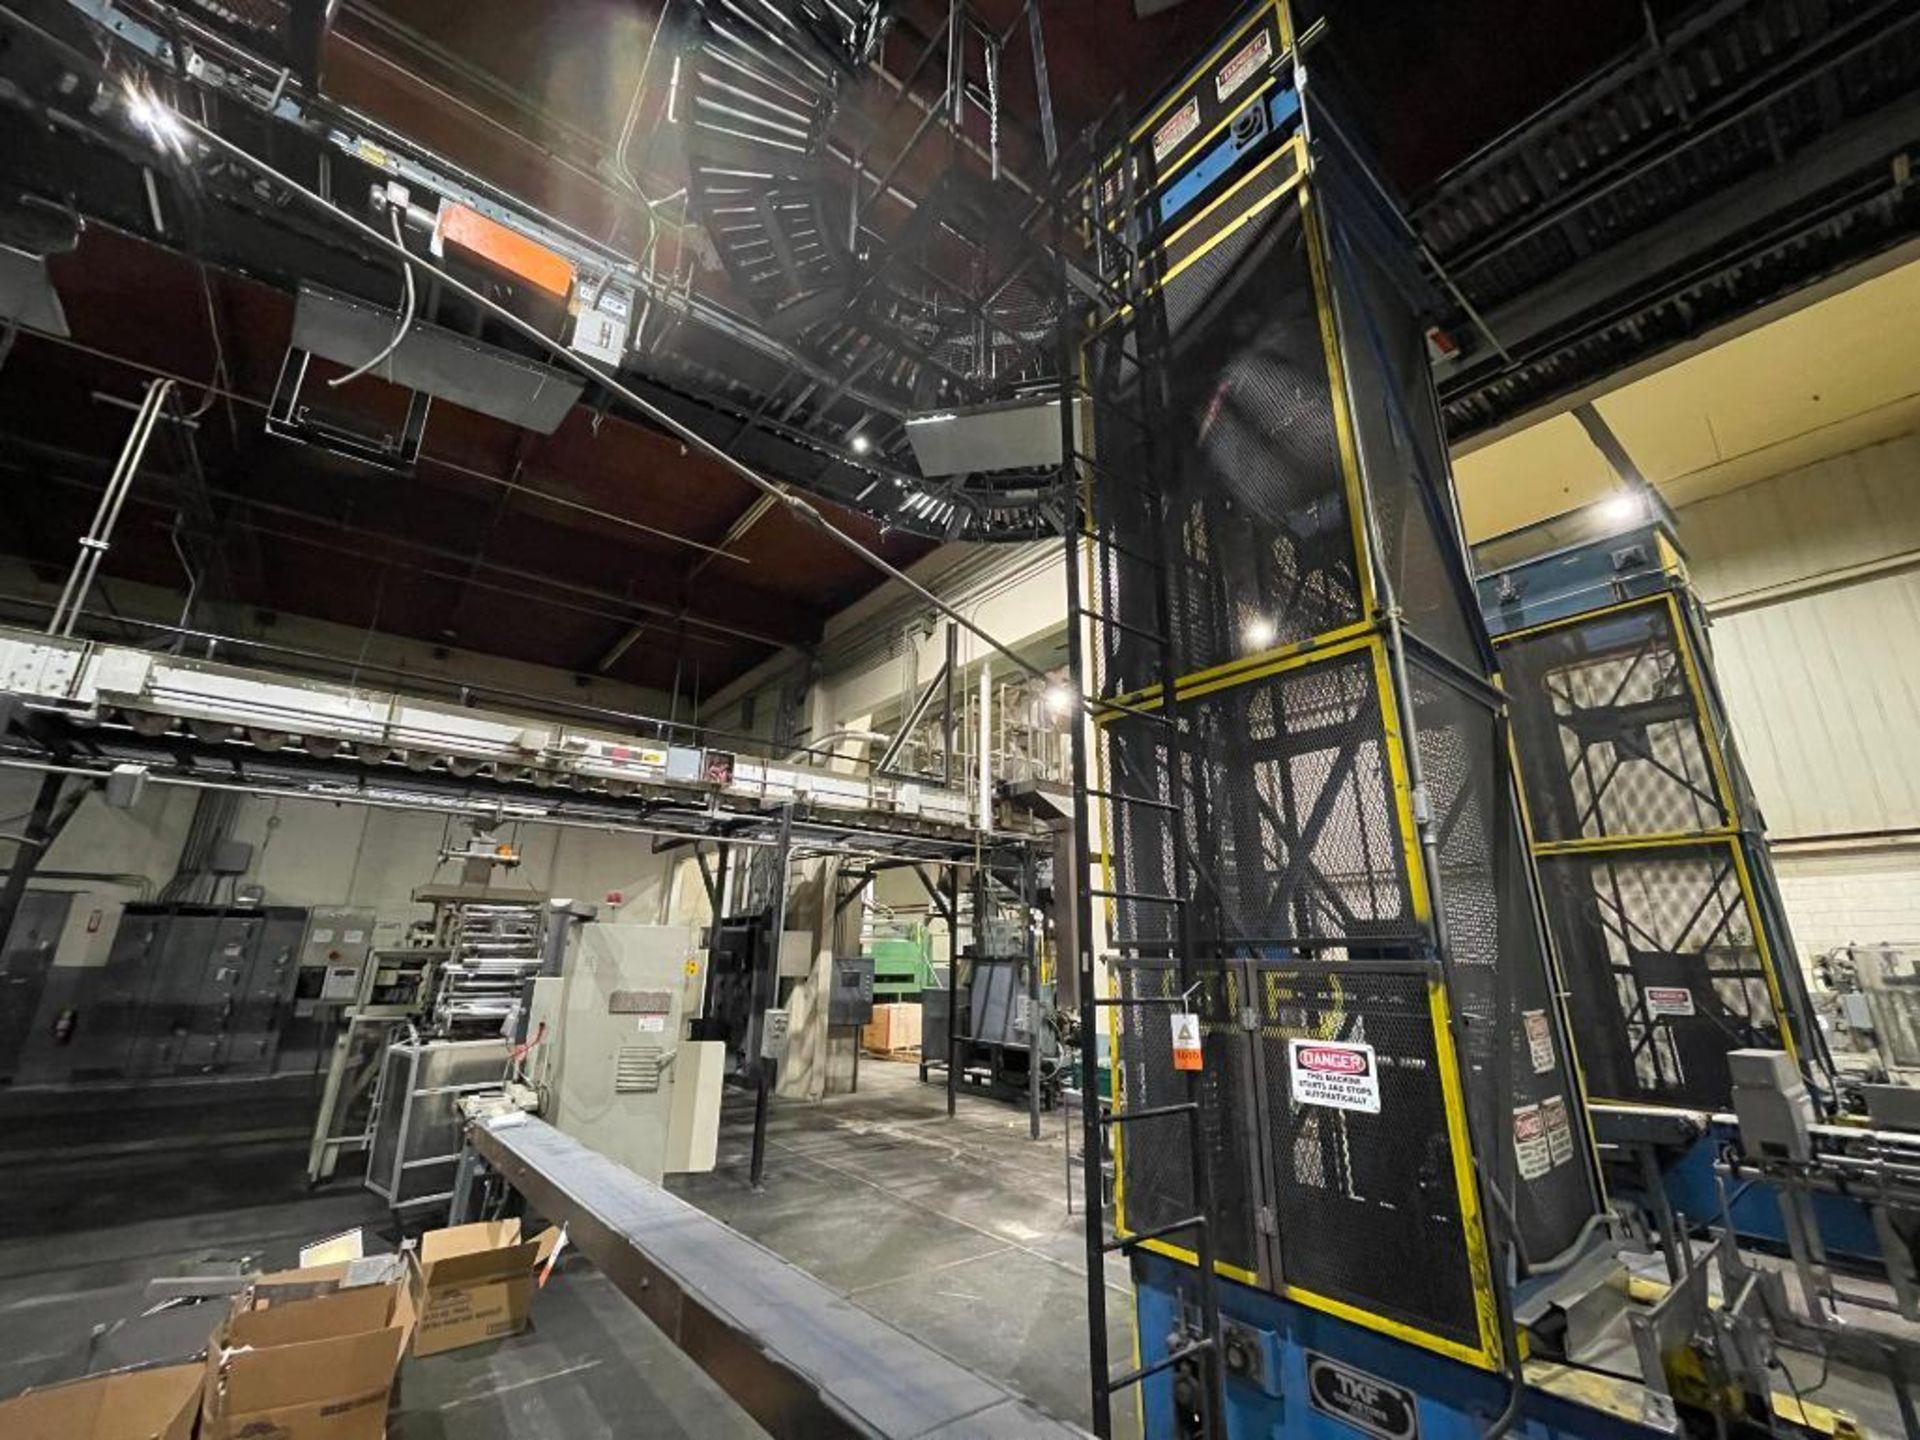 overhead power case conveyor - Image 7 of 9